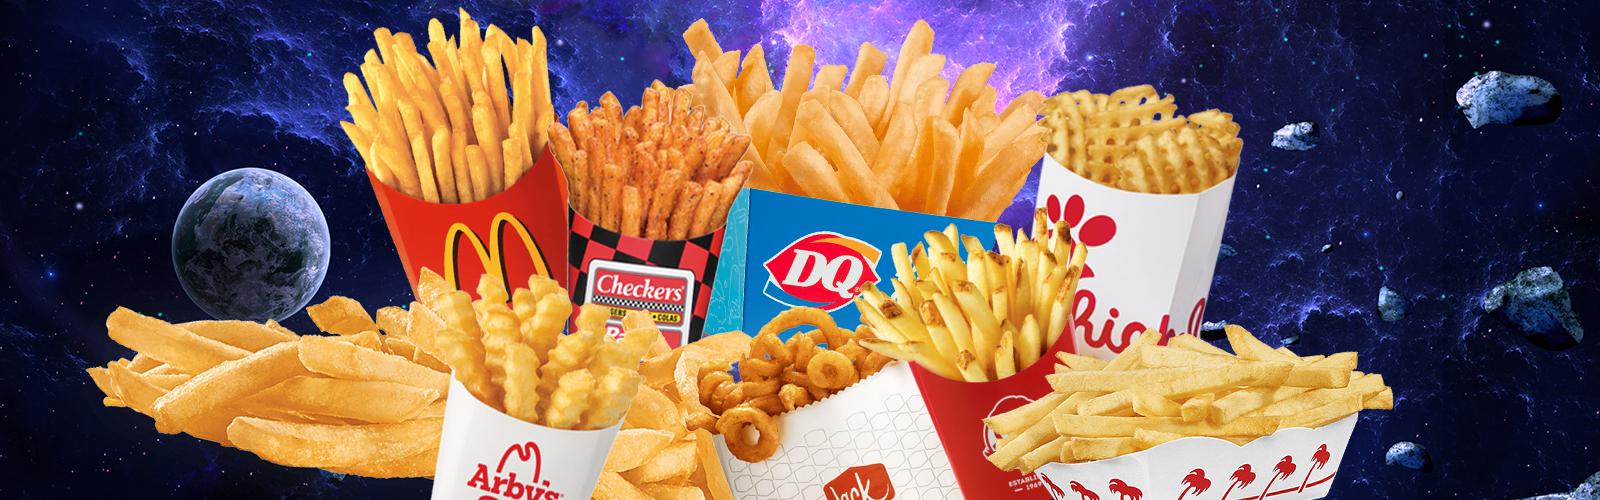 fries-tf-uproxx-3.jpg